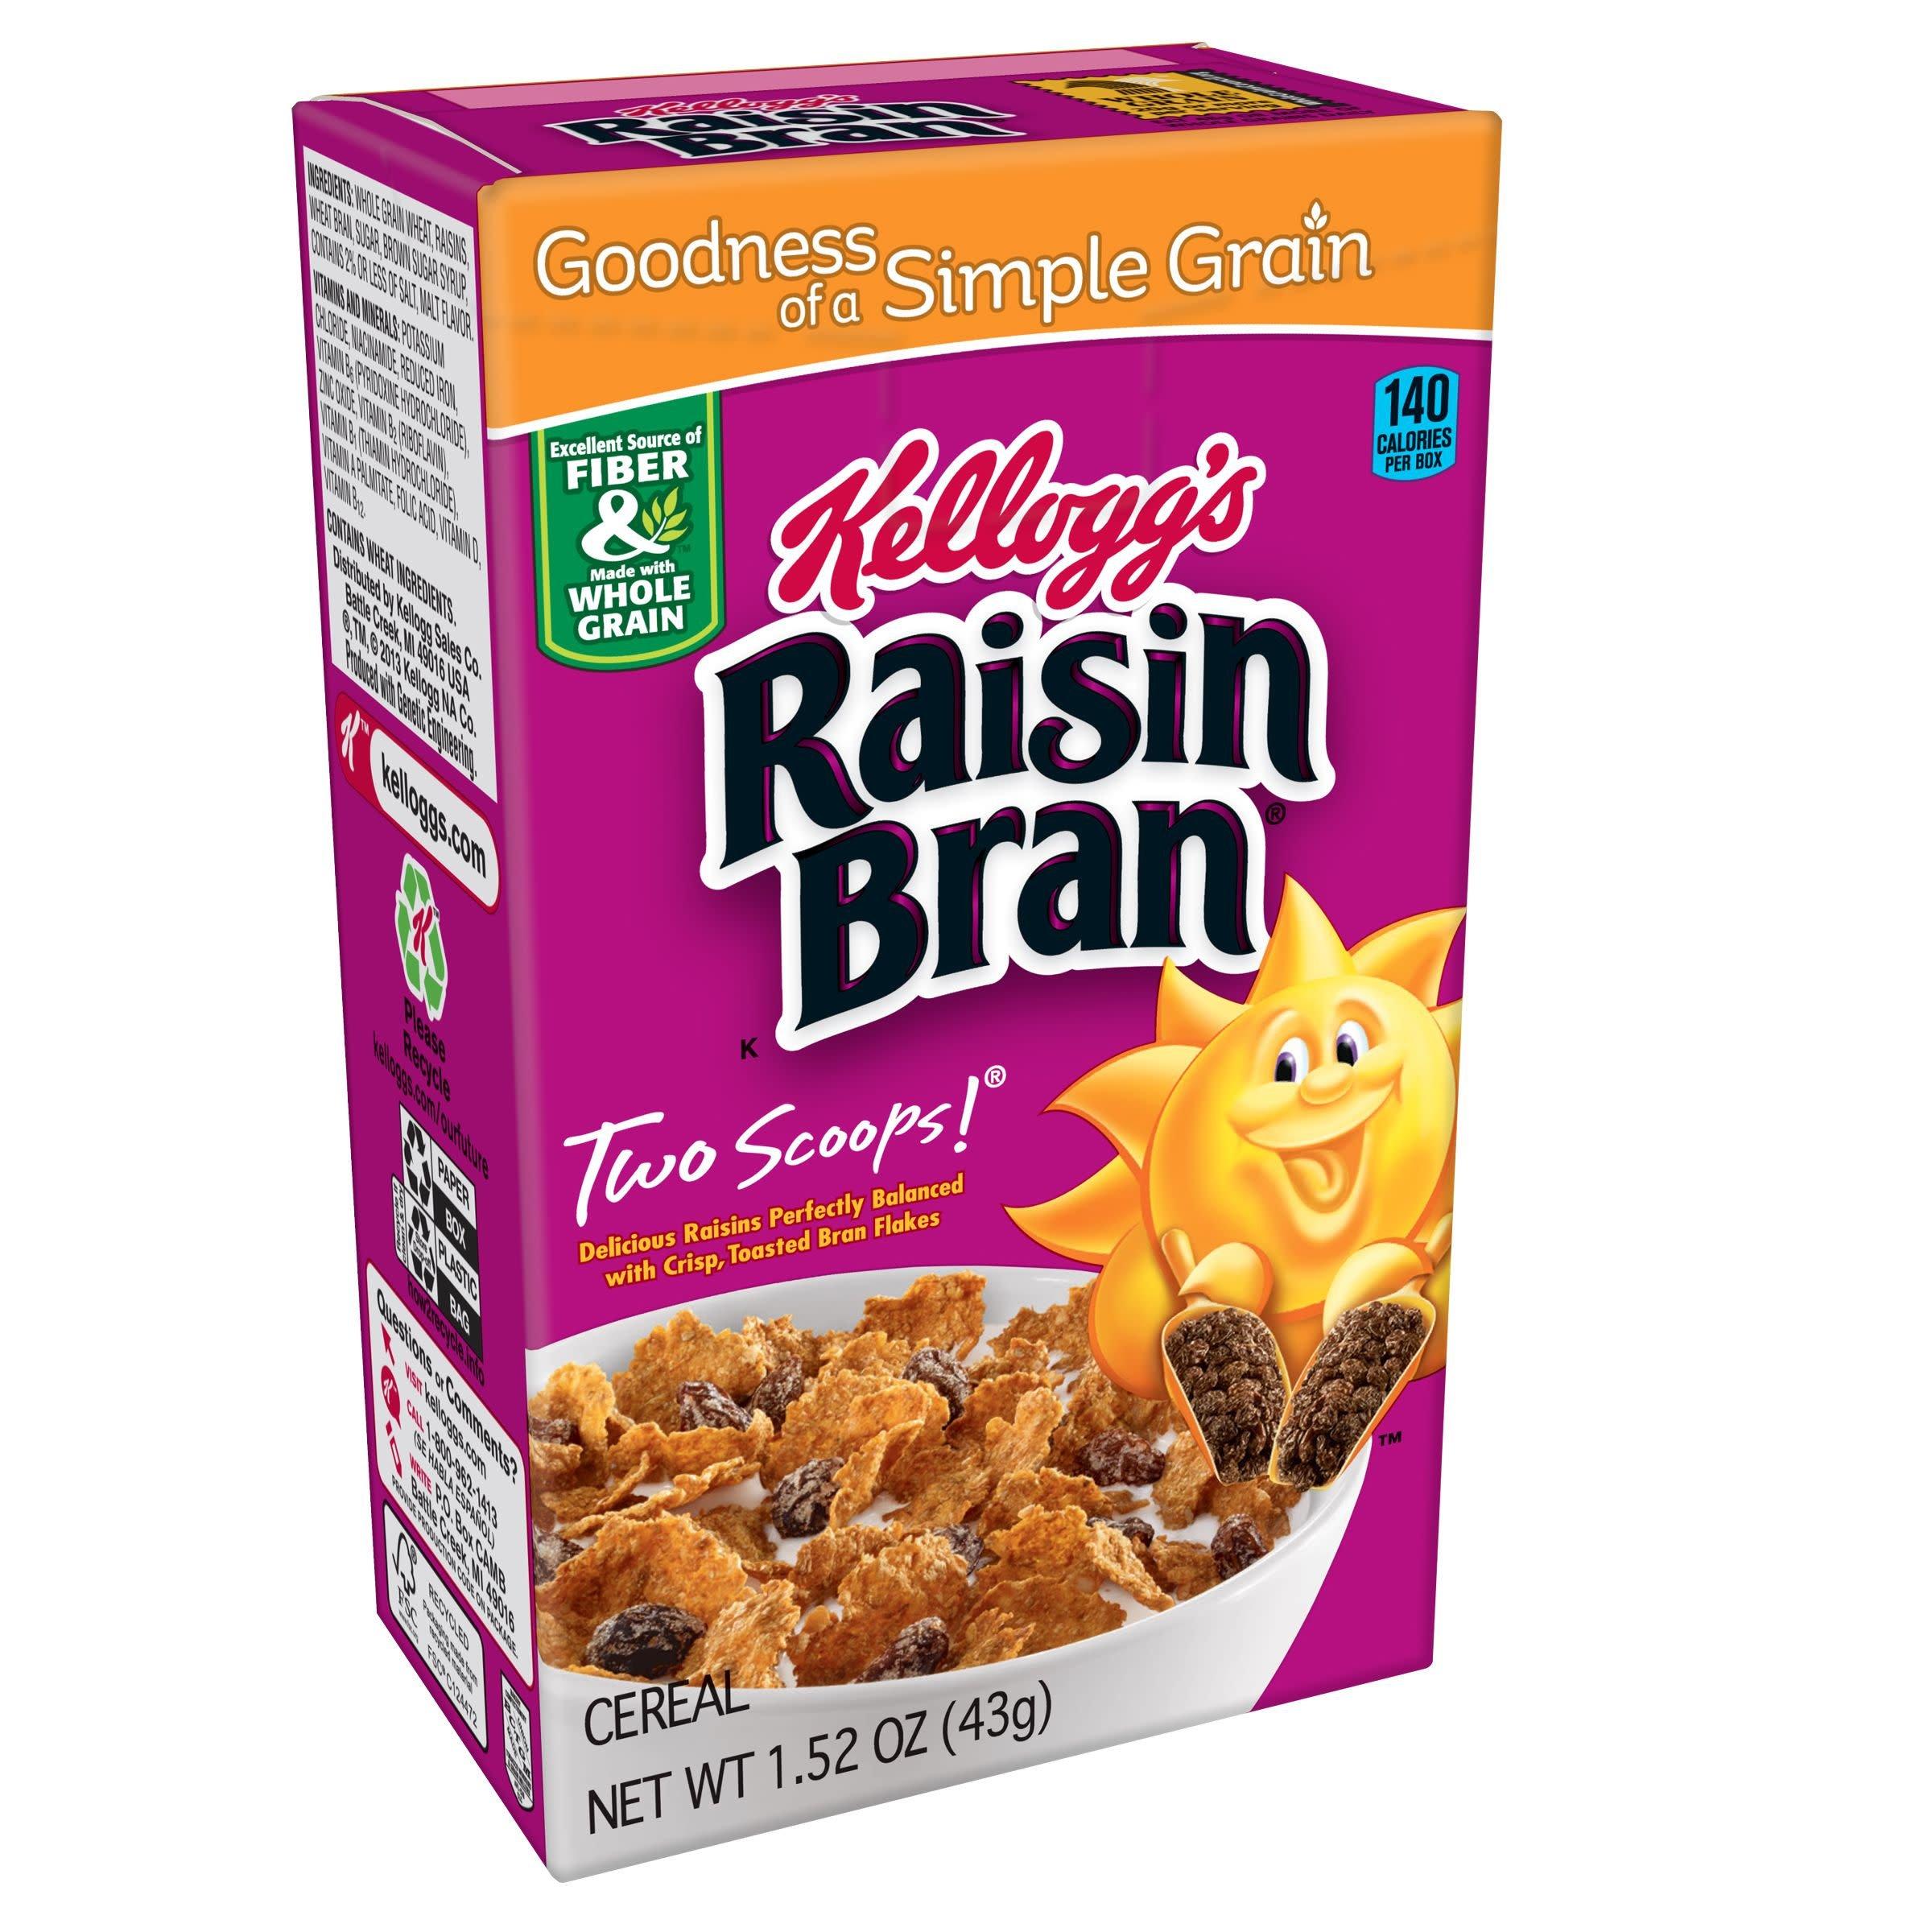 Amazon.com: Corn Flakes Kellogg's, Breakfast Cereal